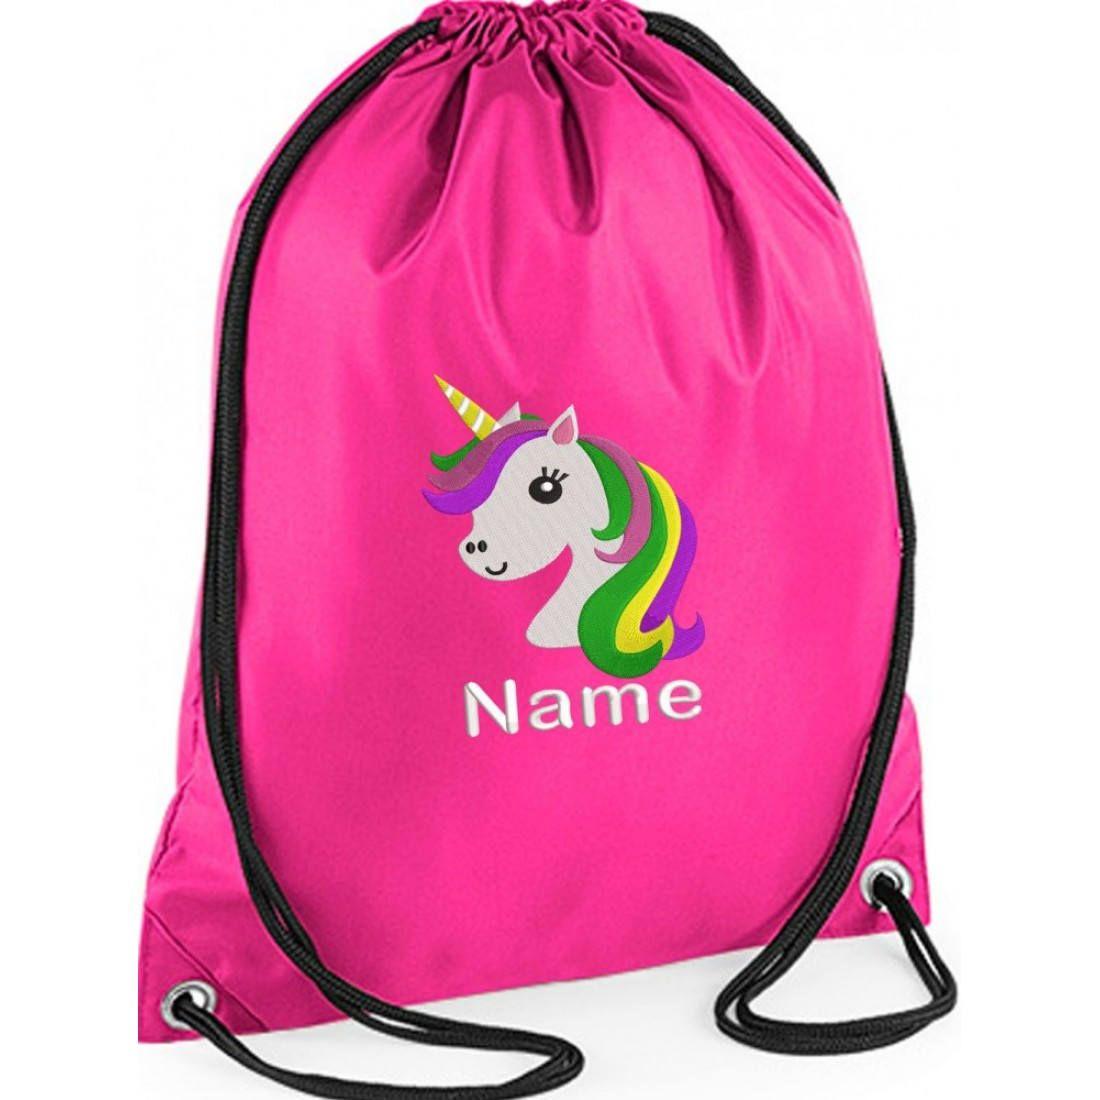 Personalised Name Drawstring Backpack Bag Girls Boy PE Gym Back to School Kids